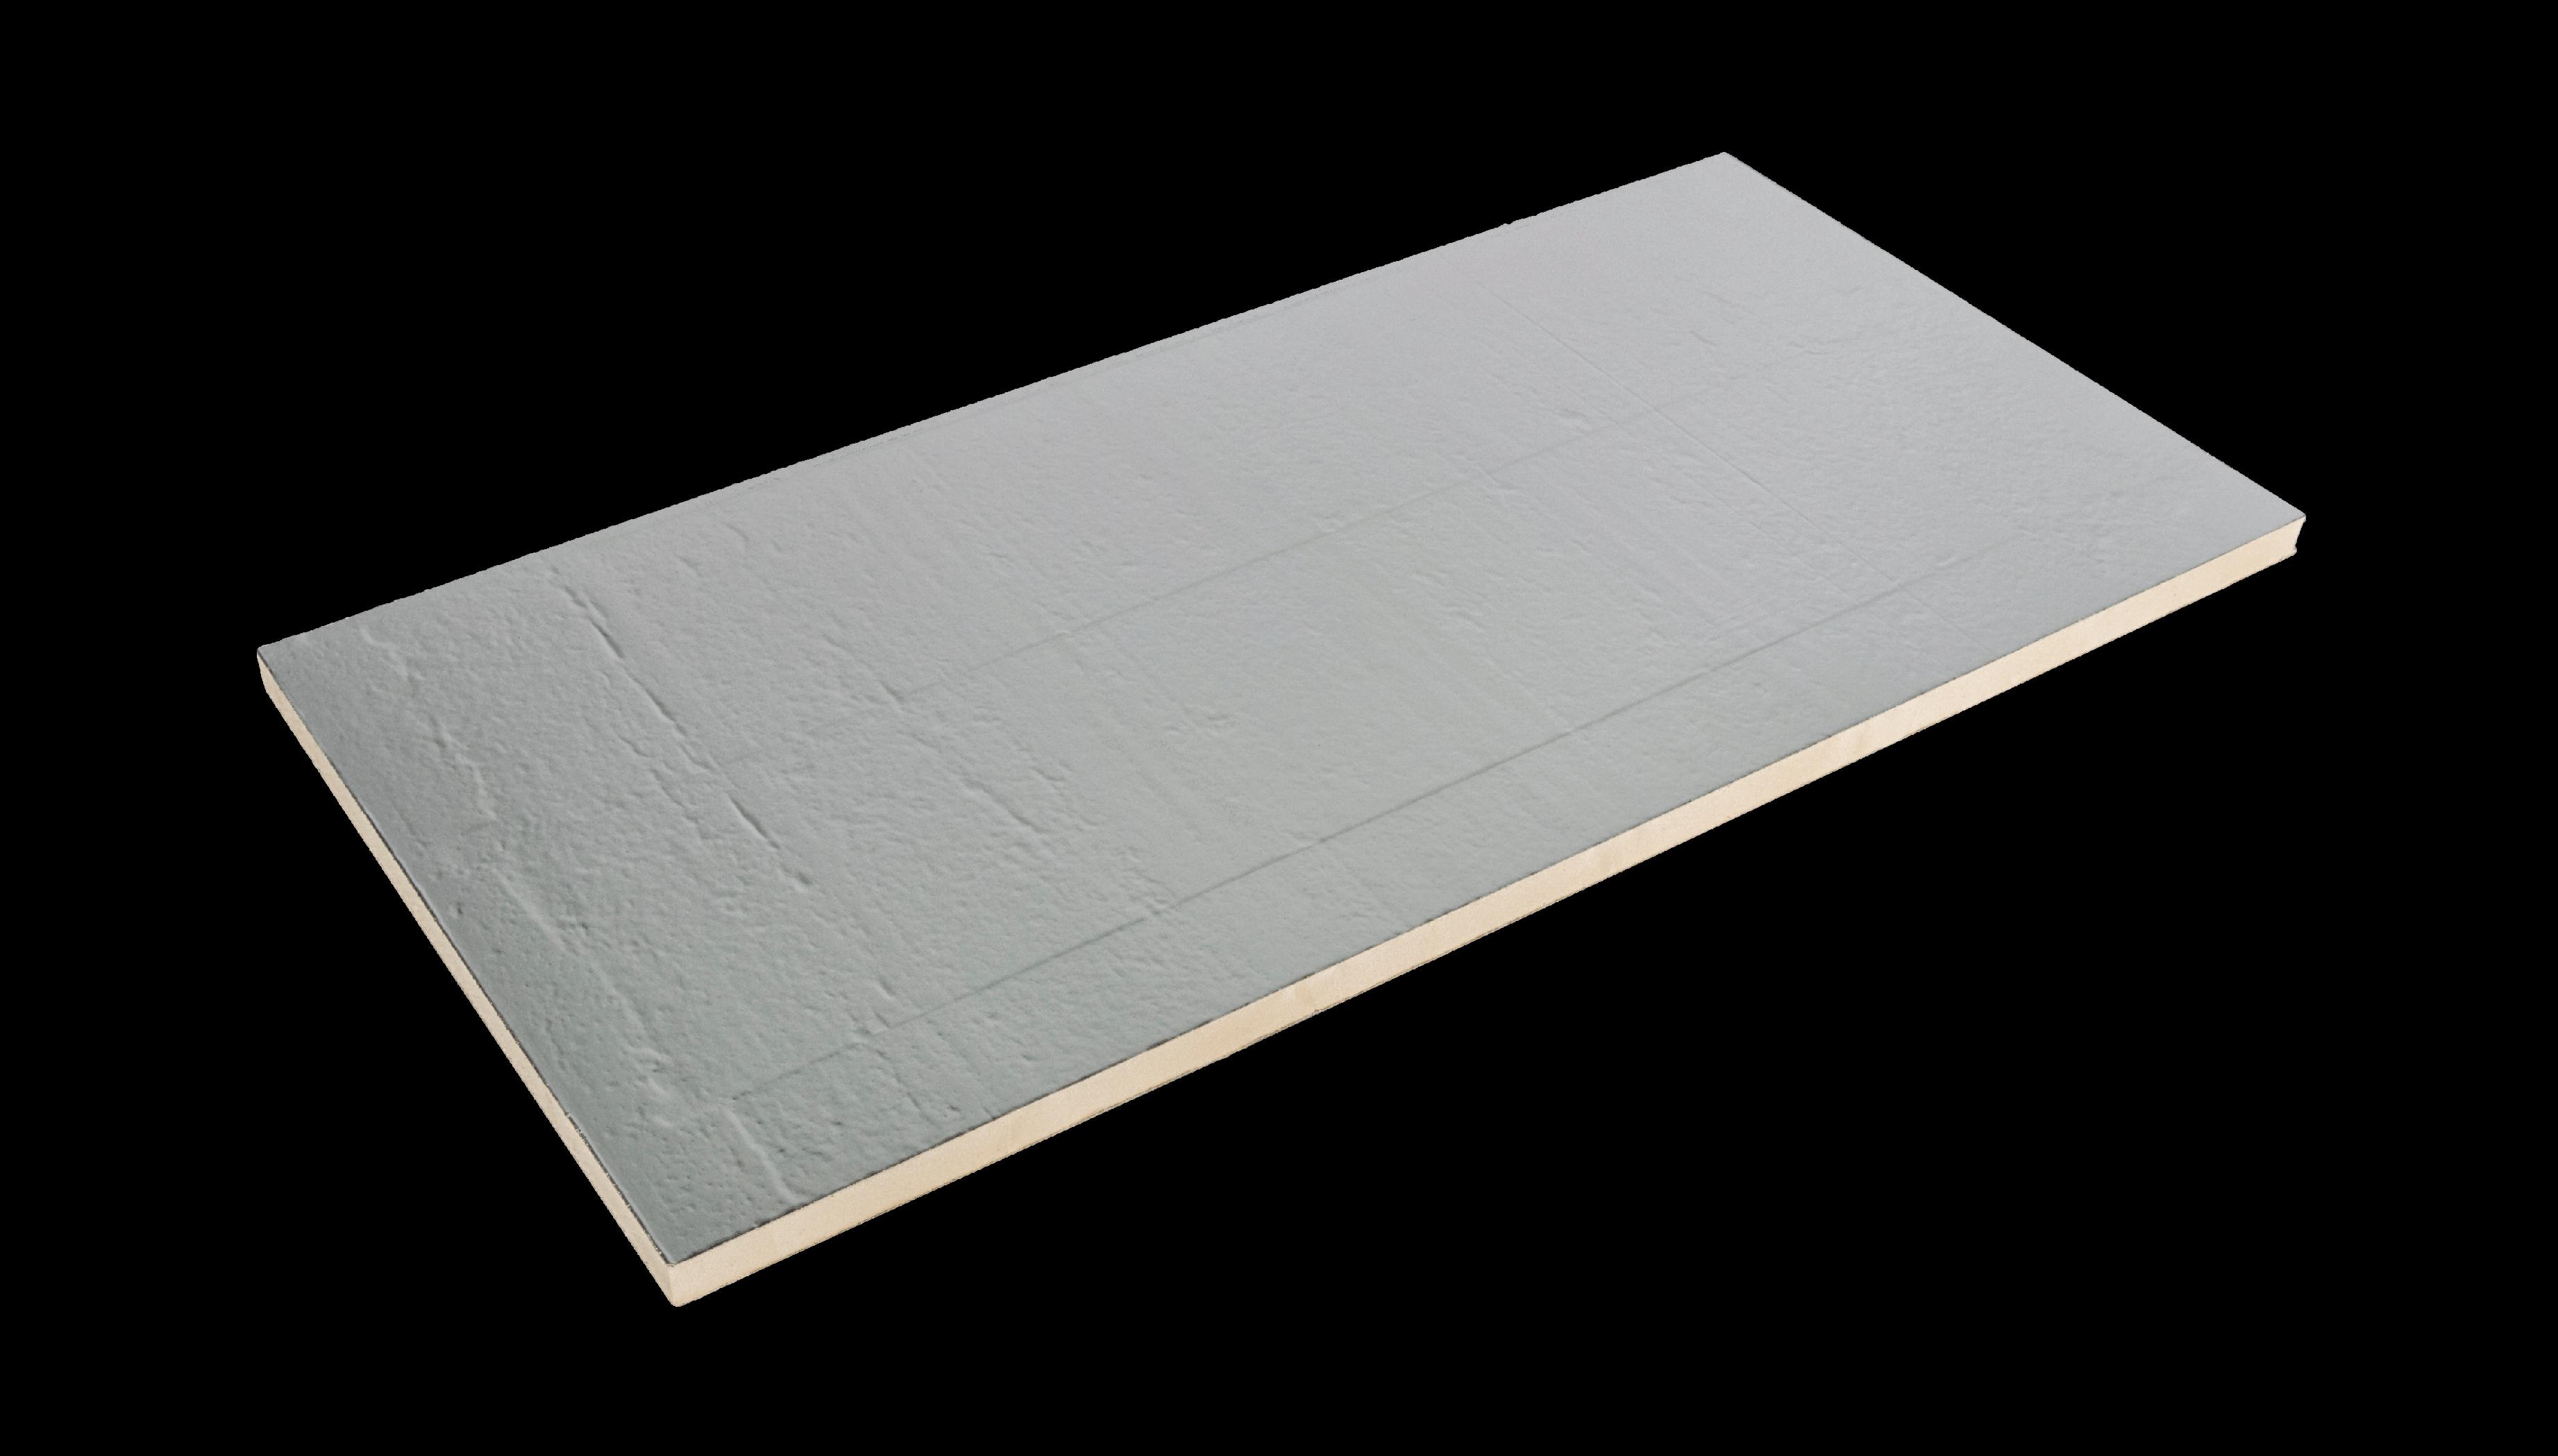 zusatzd mmung pur 024 150 kpa fu bodenheizung zubeh r f rdetherm. Black Bedroom Furniture Sets. Home Design Ideas